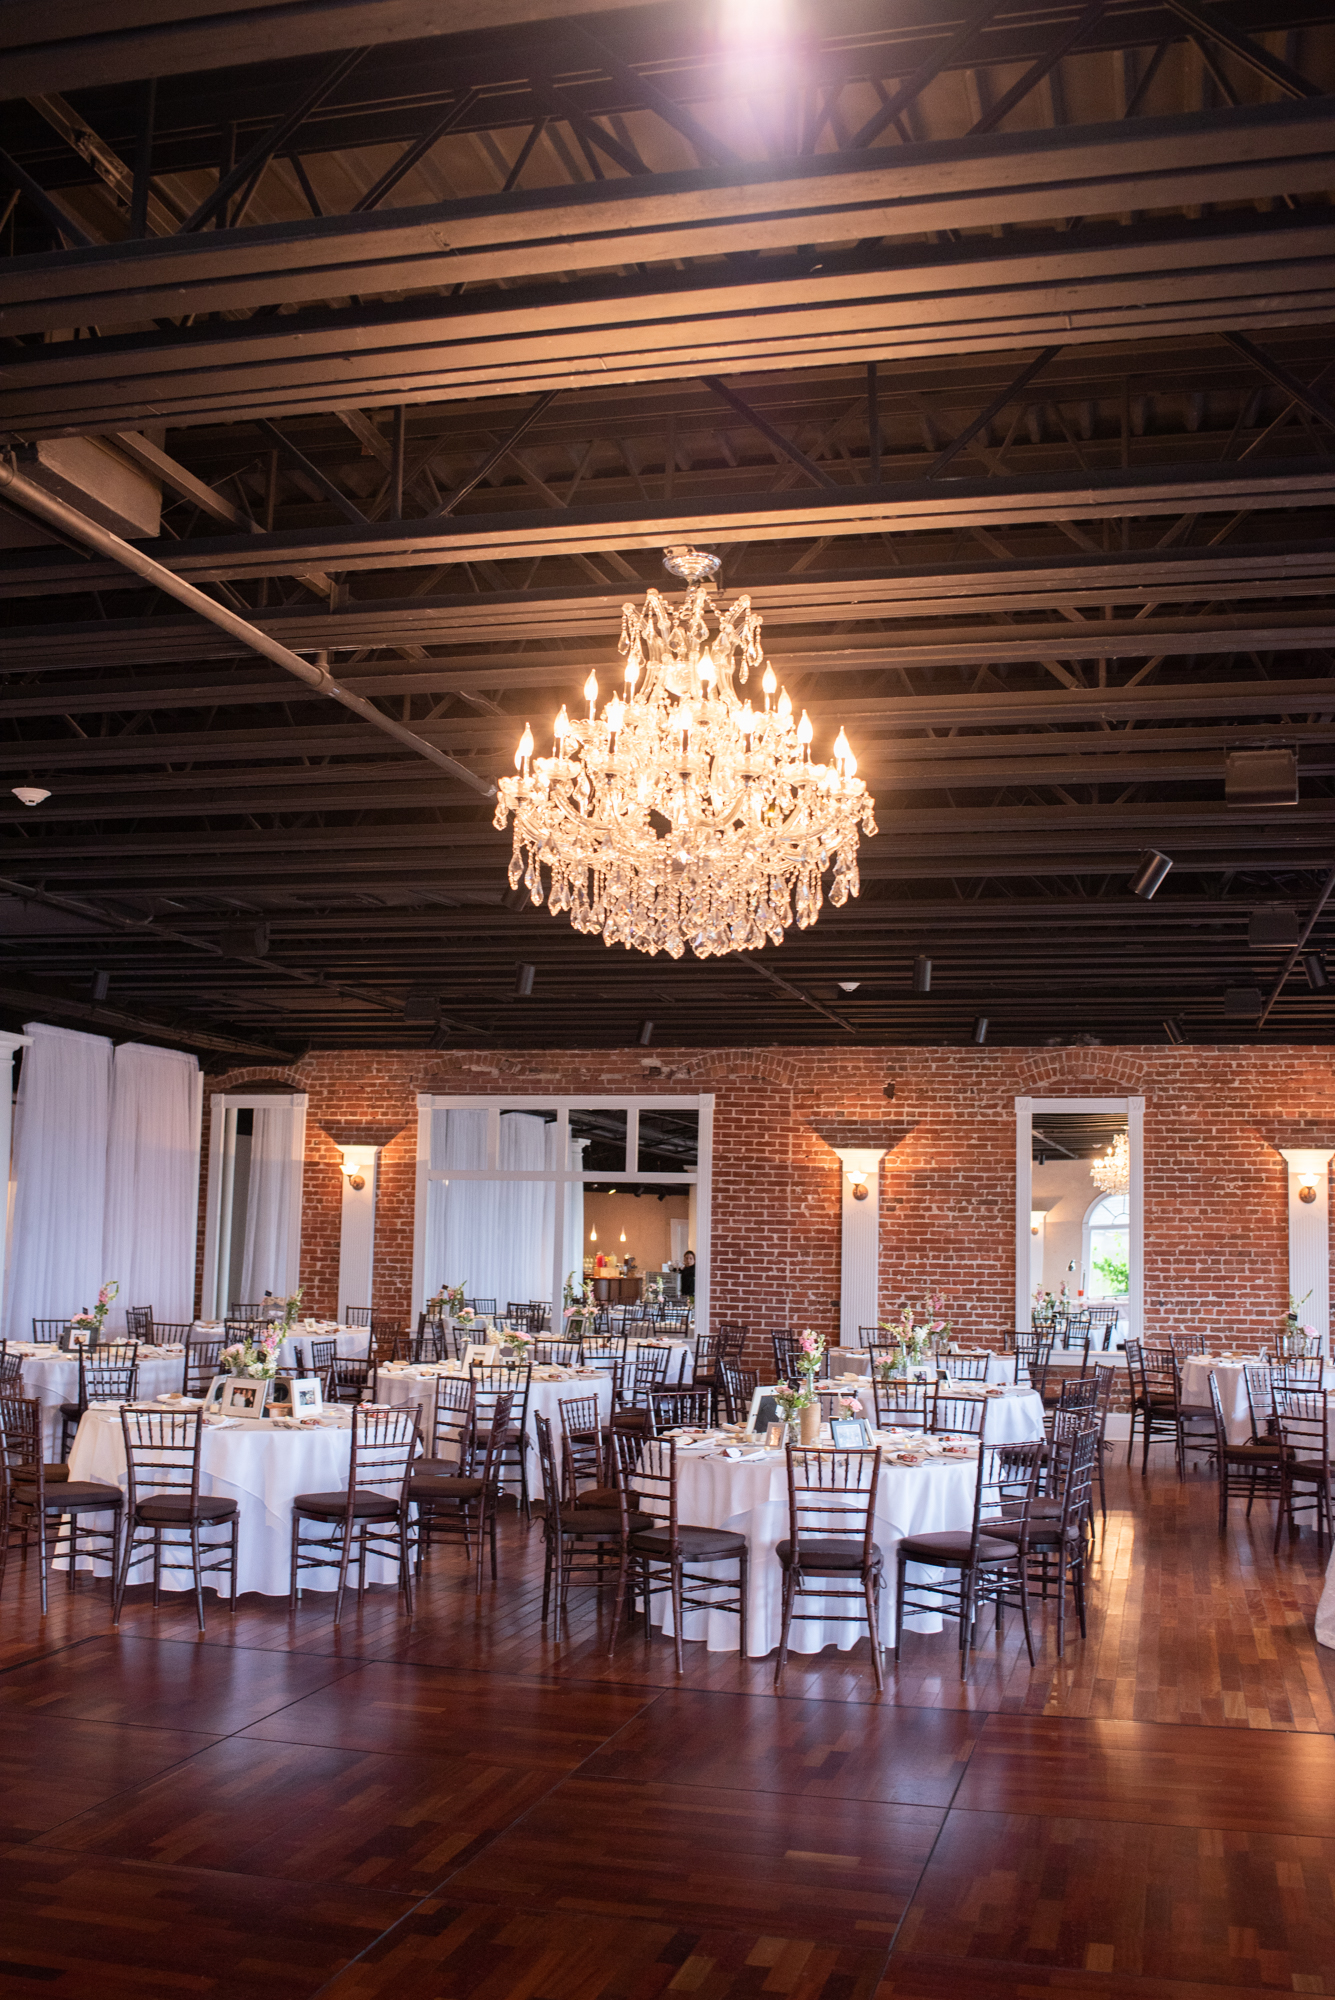 st-augustine-photographer-st-augustine-gay-wedding-sam-sex-wedding-photographer-sarah-annay-photography-white-room-weddings-49.jpg